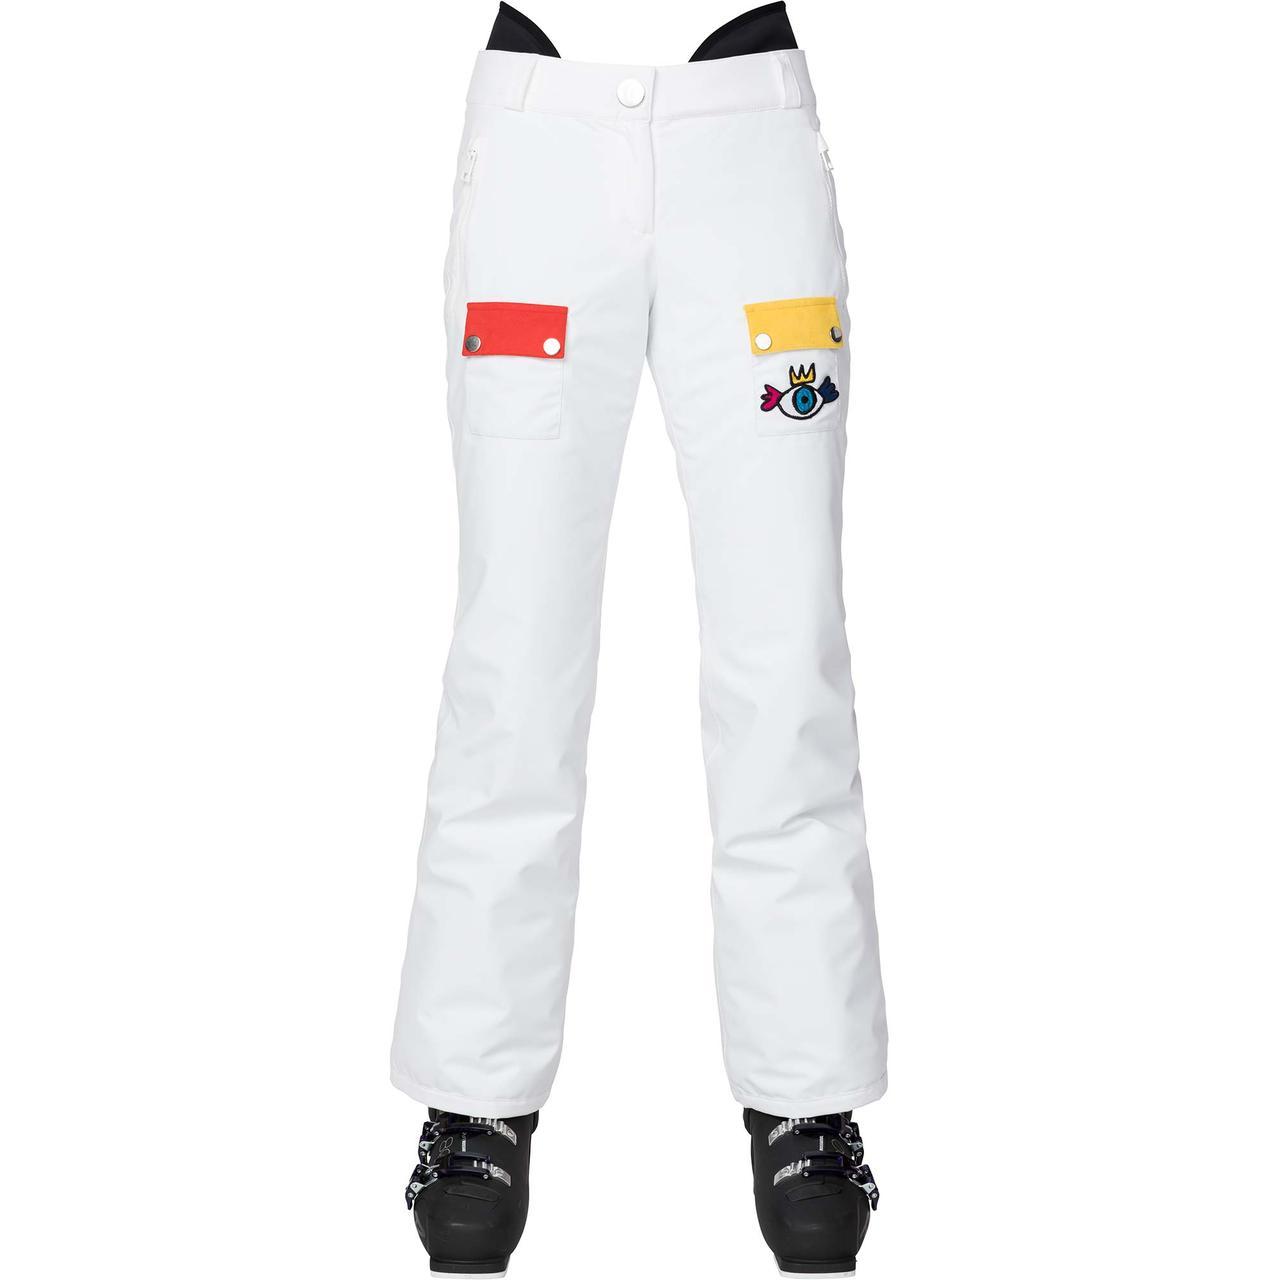 Горнолыжные штаны Rossignol CastelBajac W AIRSYN PANT